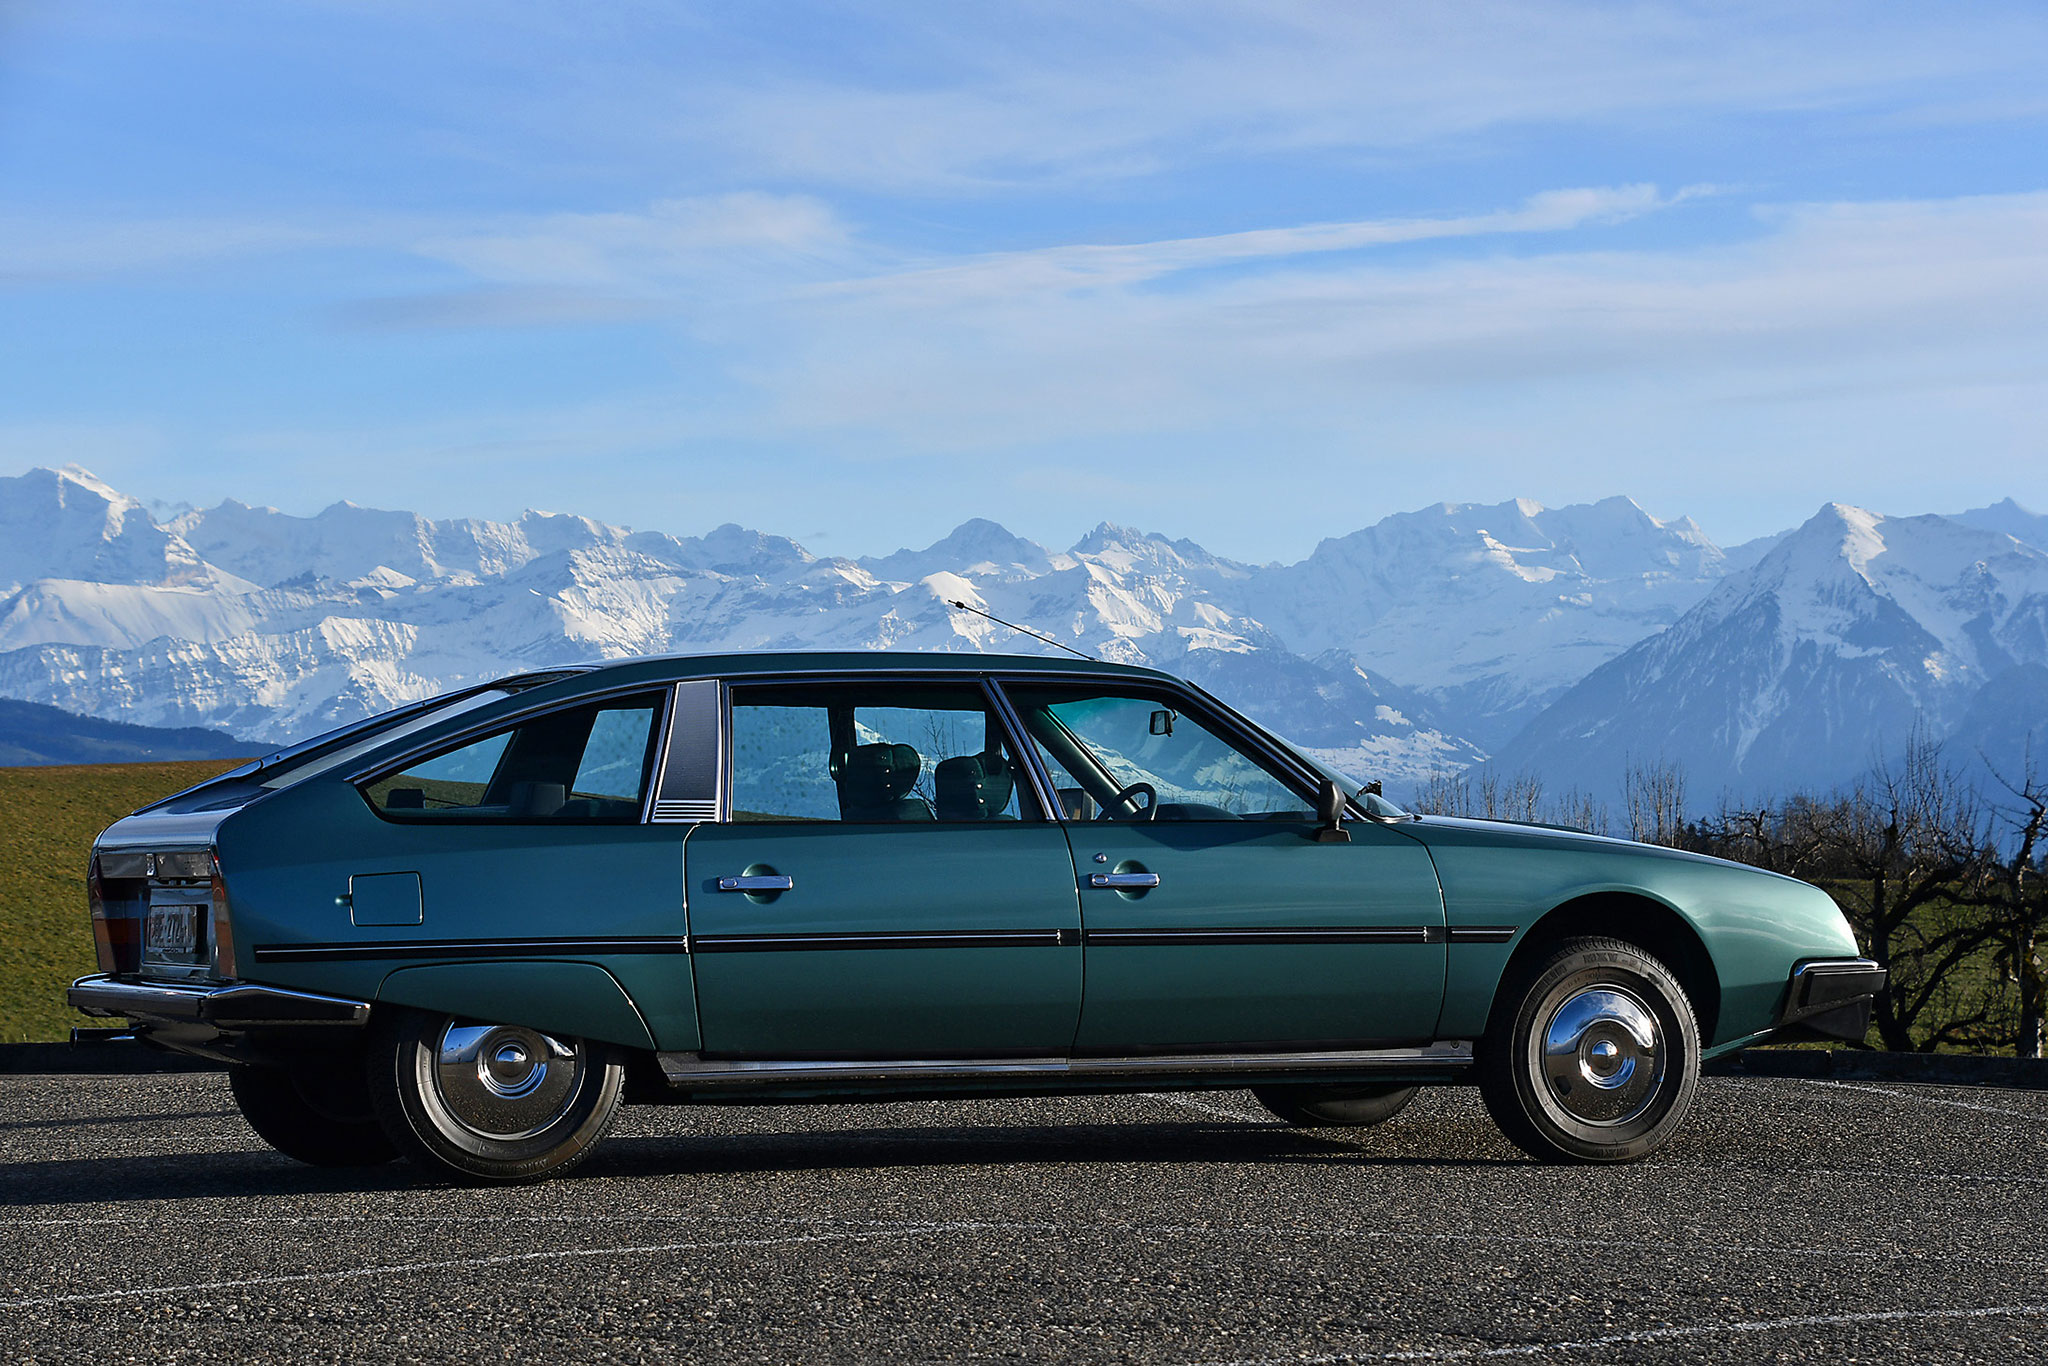 1981 Citroen CX Limousine Diesel - Oldtimer Galerie.